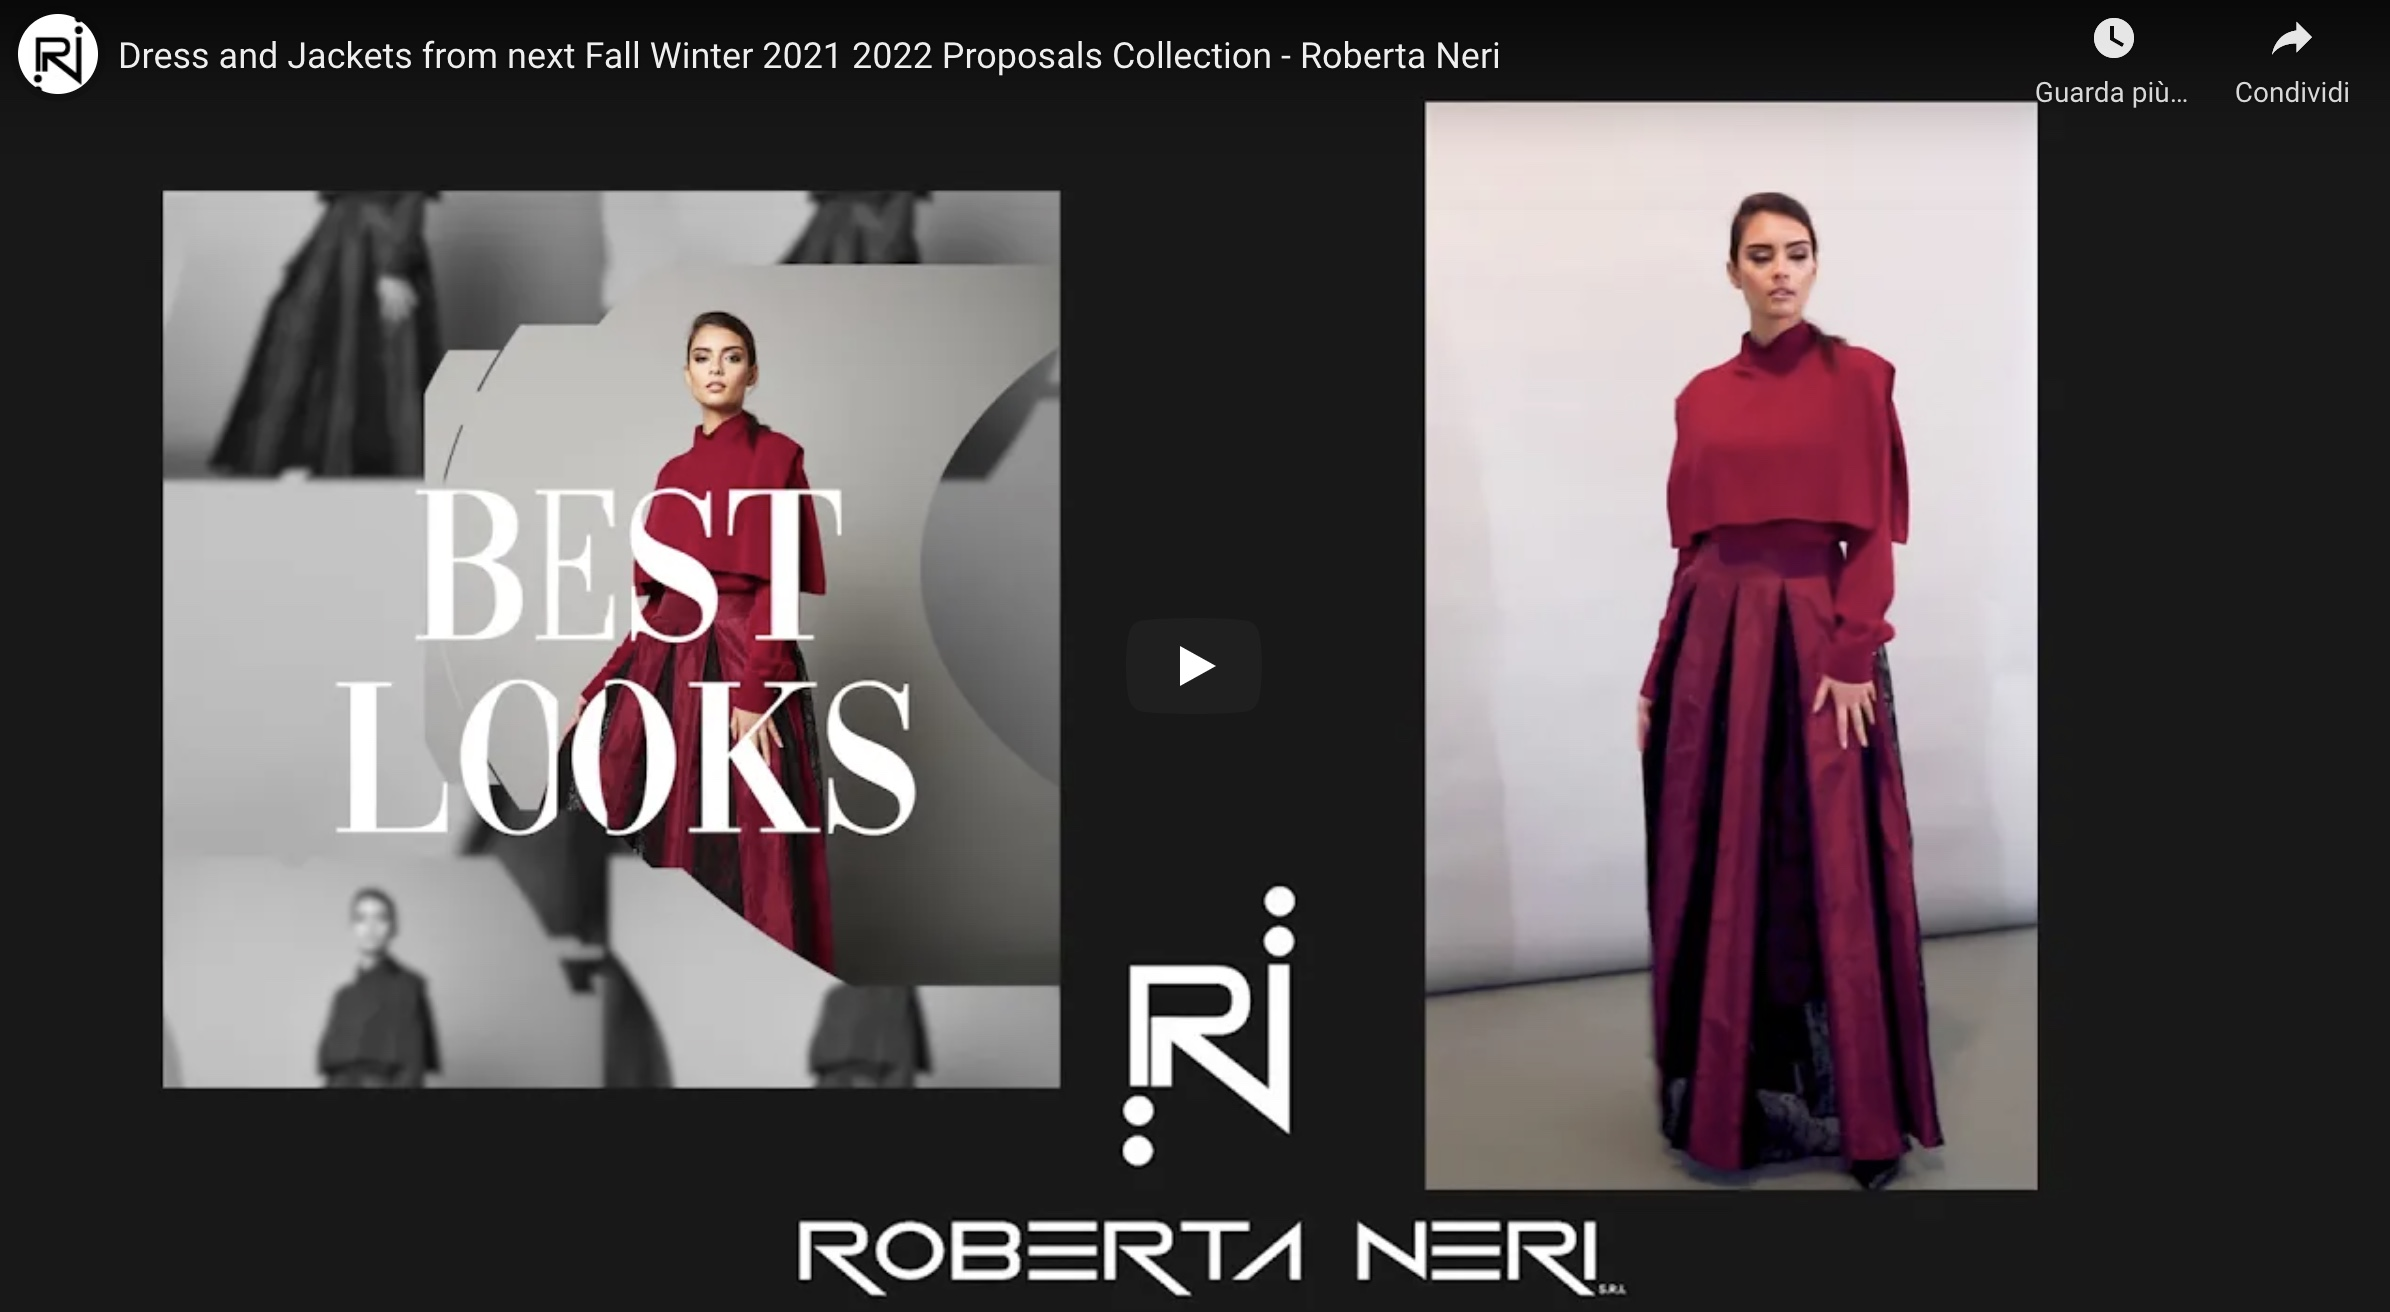 roberta-neri-fall-winter-2021-2022